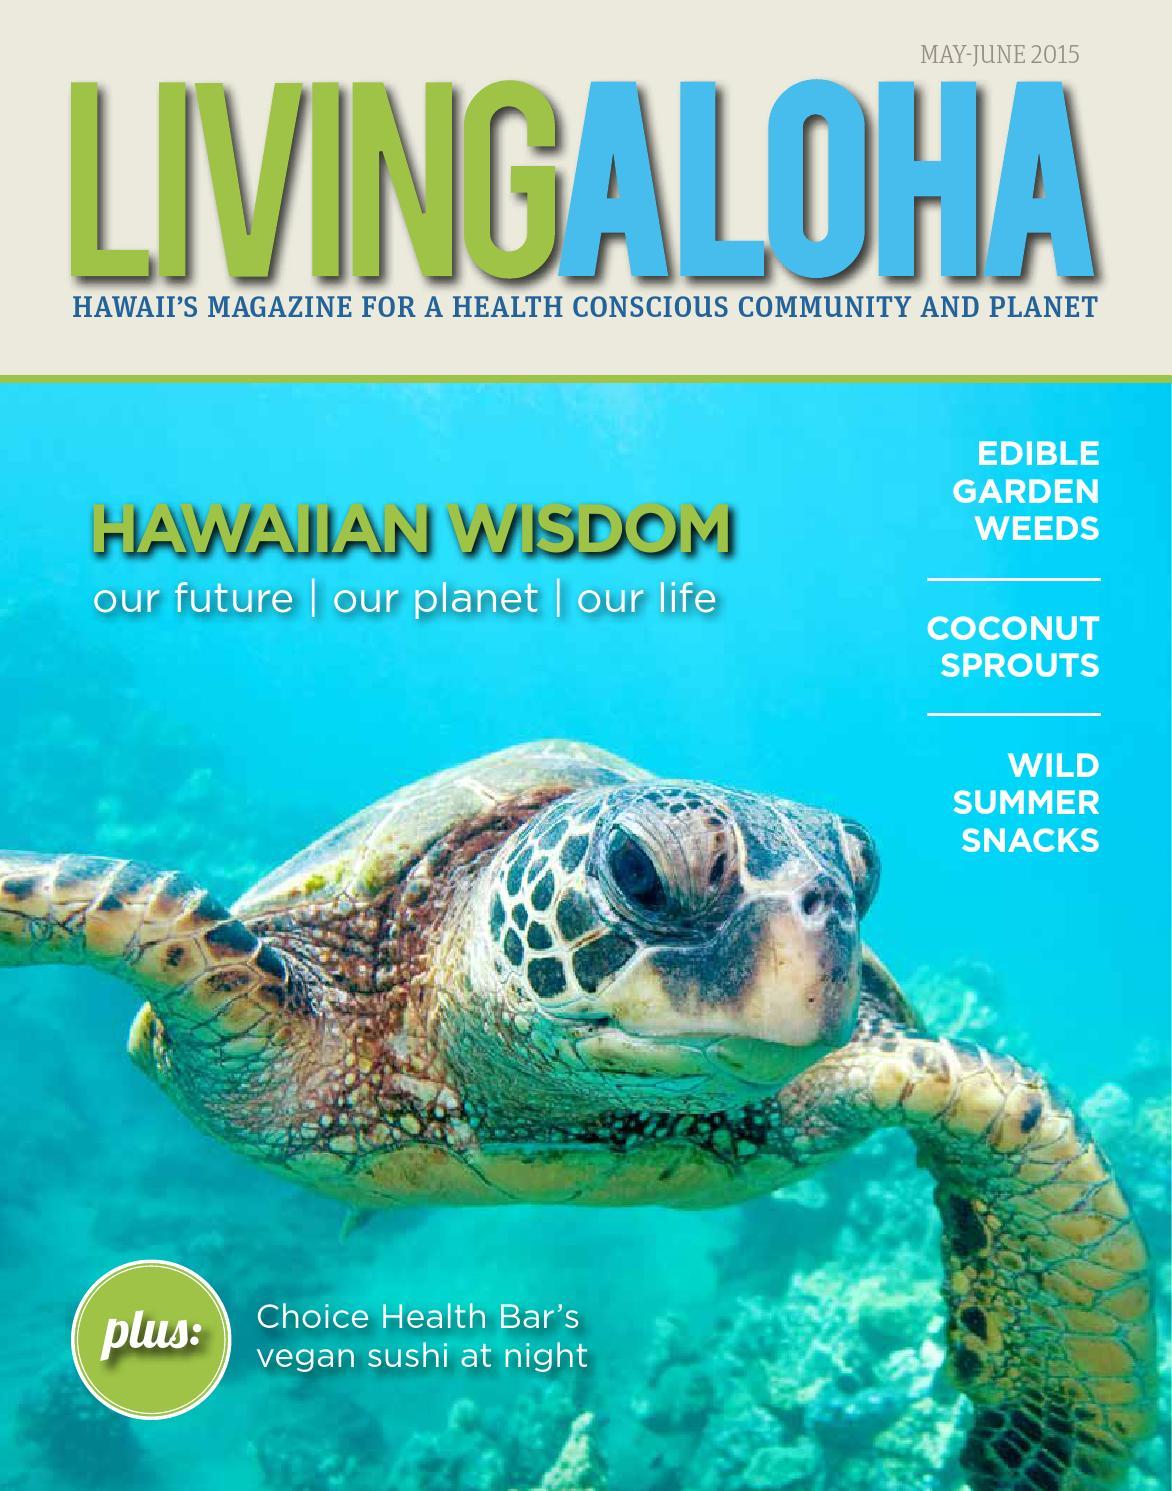 Living Aloha Magazine May June 2015 Issue Maui Hawaii By Living Aloha Magazine Maui